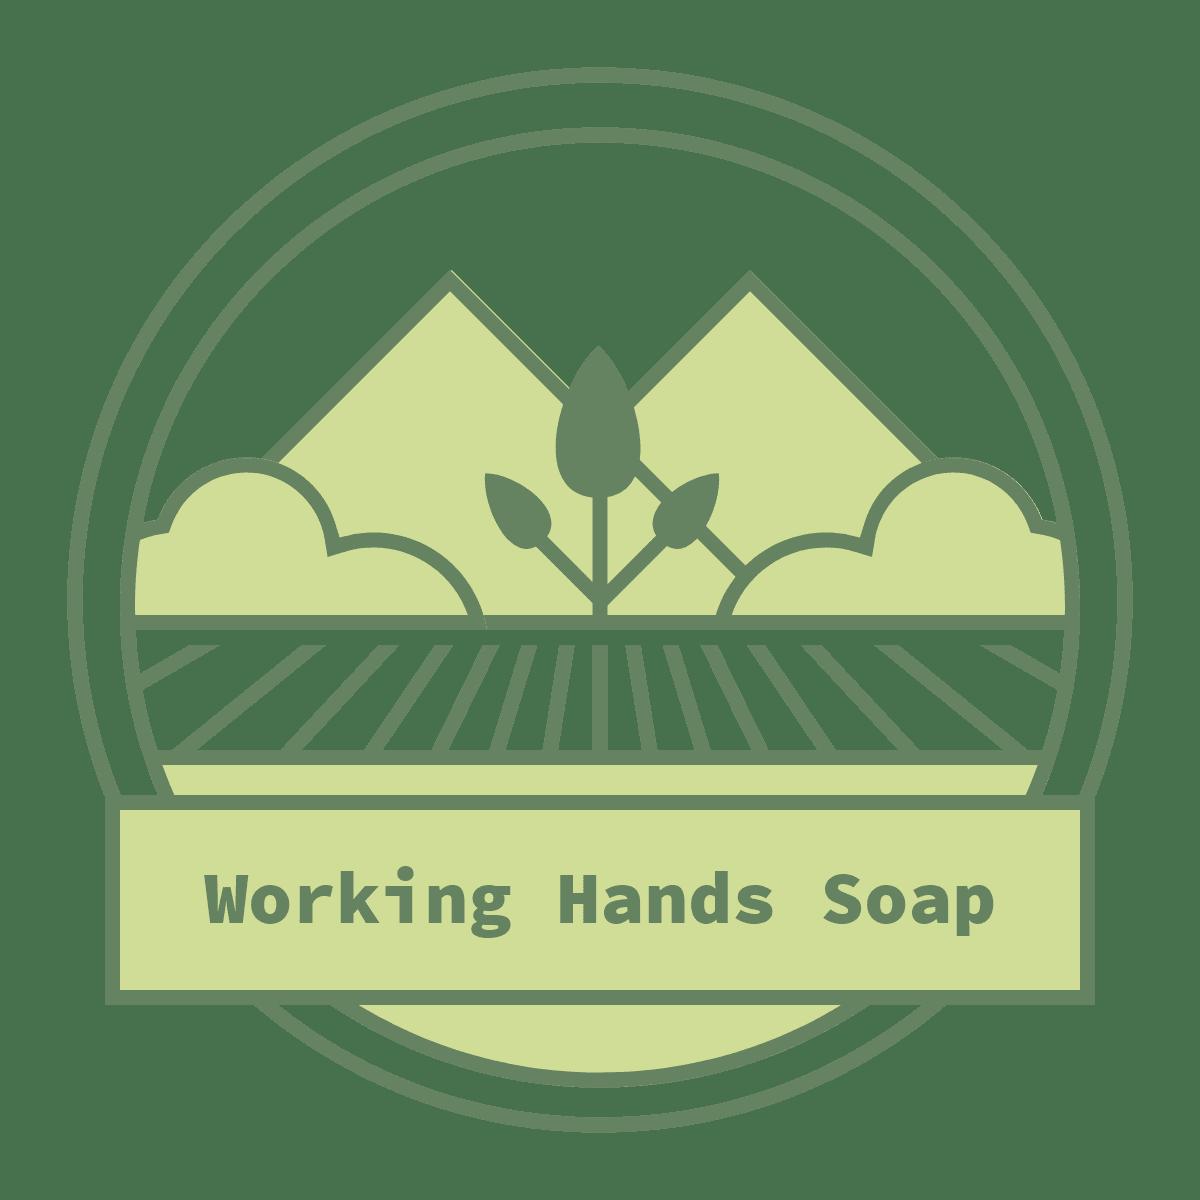 Working Hands Soap